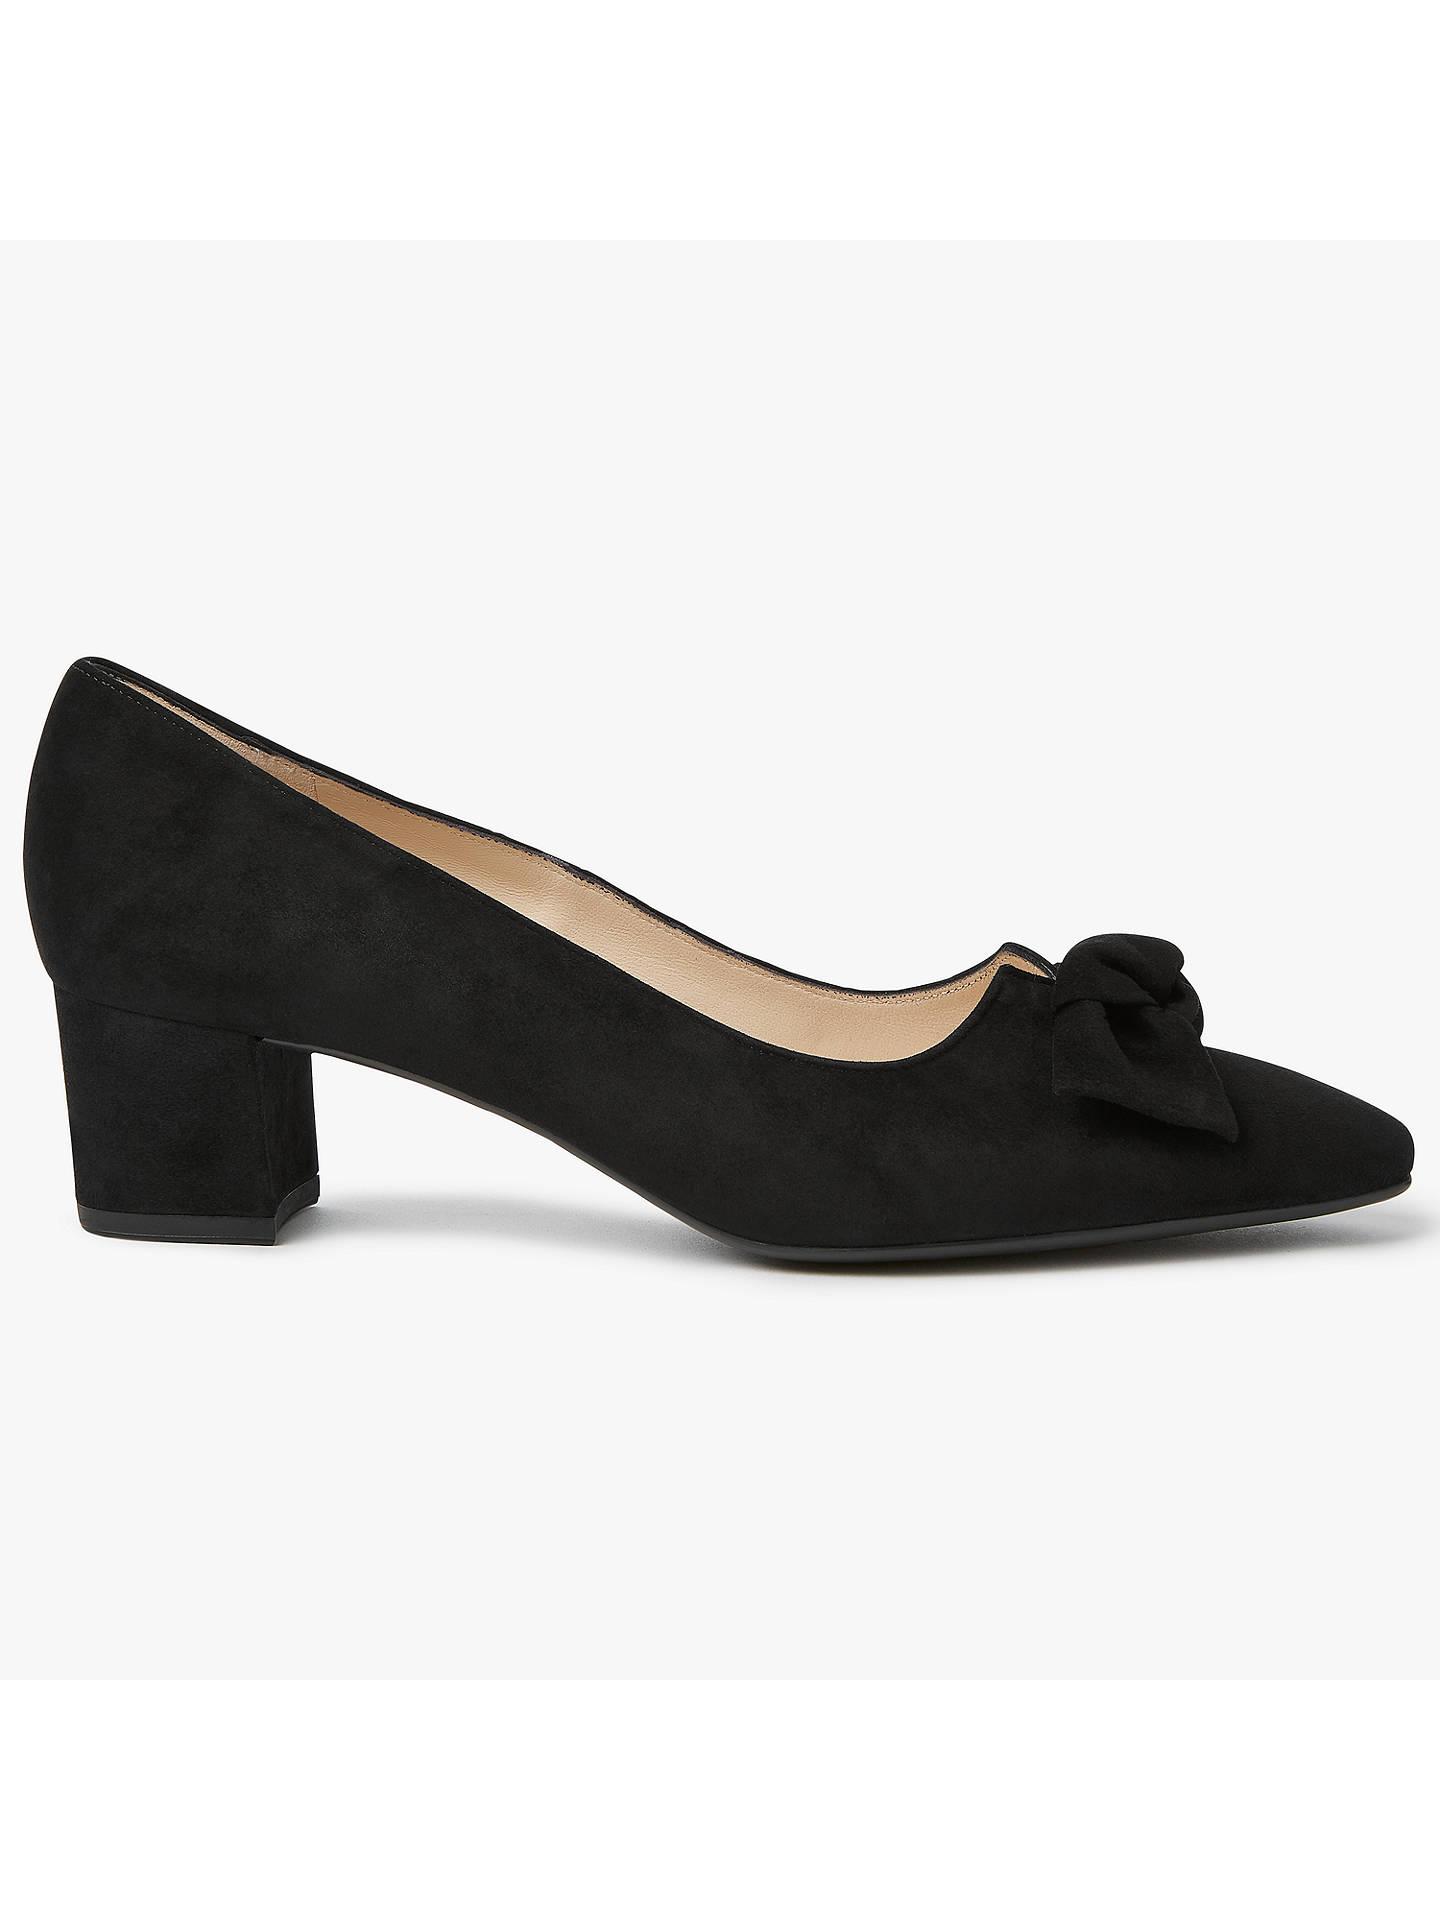 82d1e41ed34 Peter Kaiser Binella Mid Block Heel Bow Court Shoes at John Lewis ...